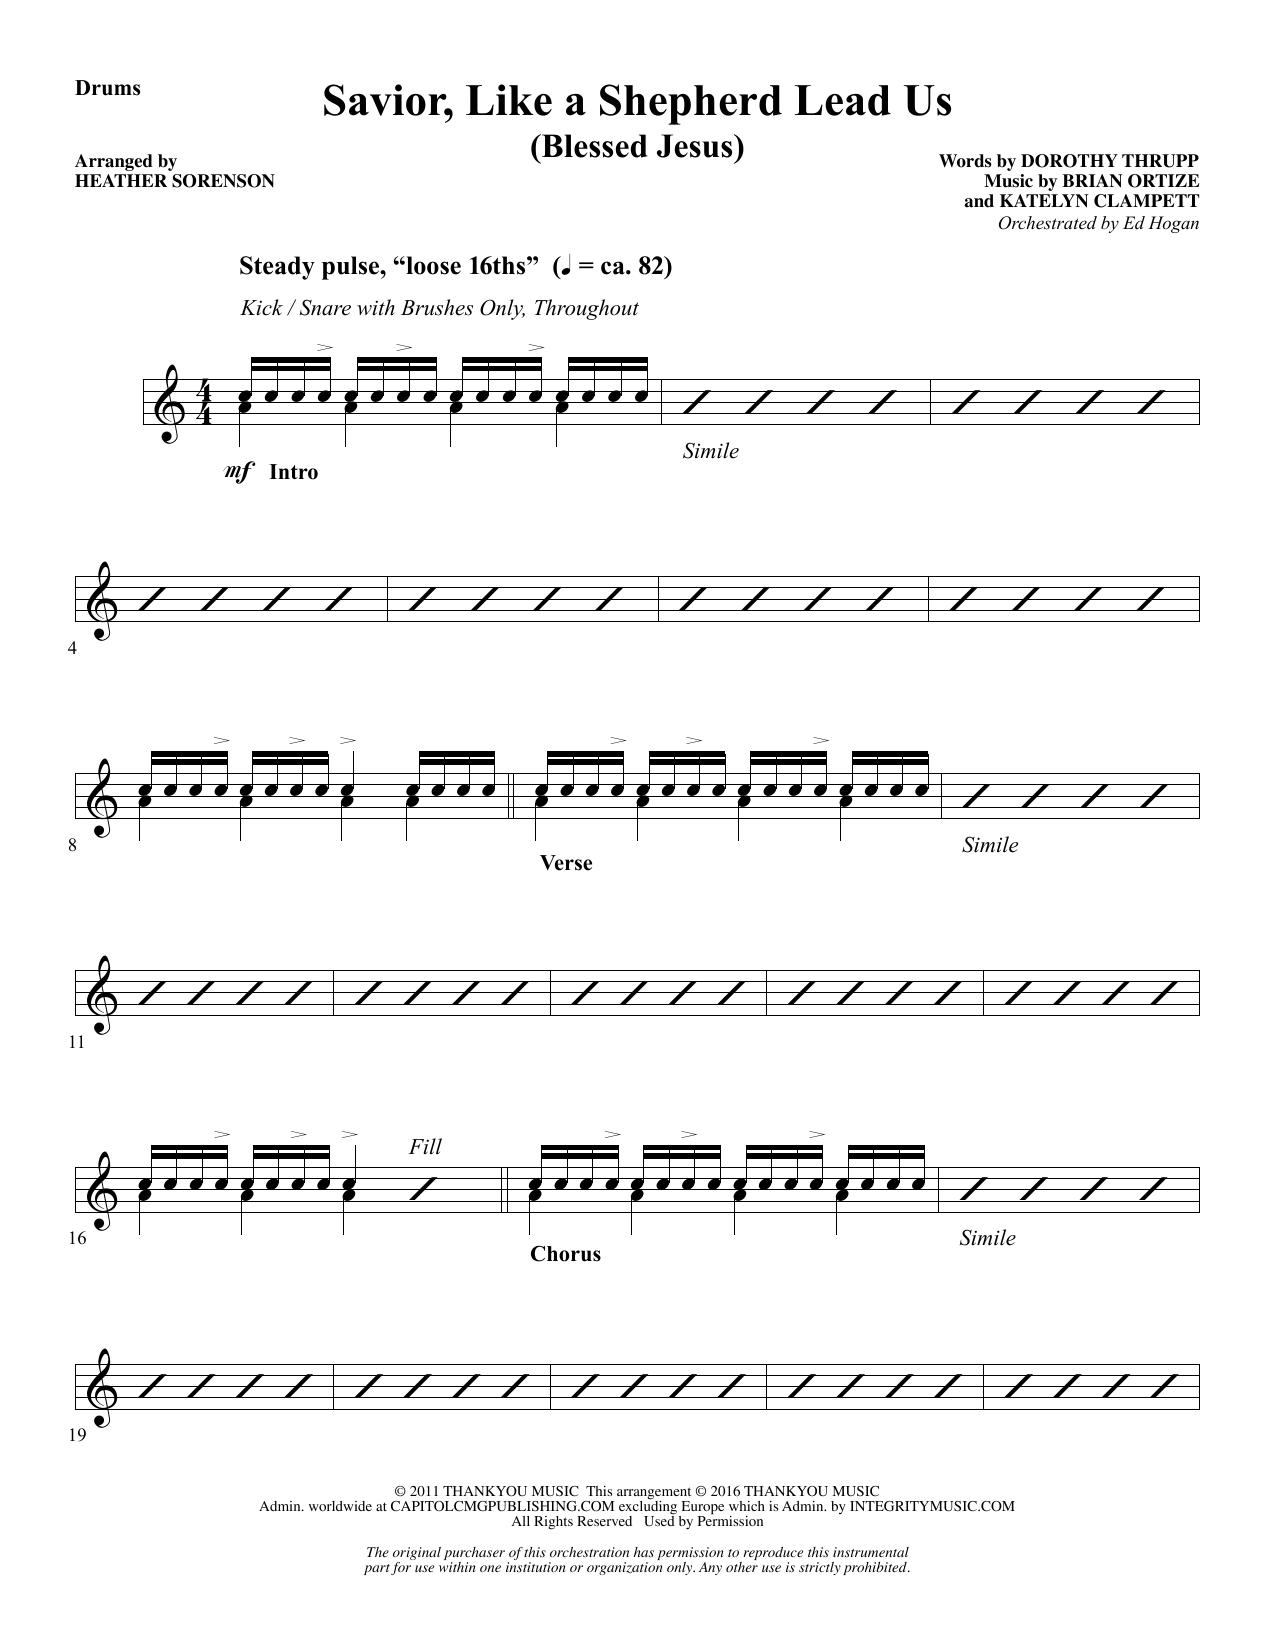 Savior, Like a Shepherd Lead Us (Blessed Jesus) - Drums Sheet Music